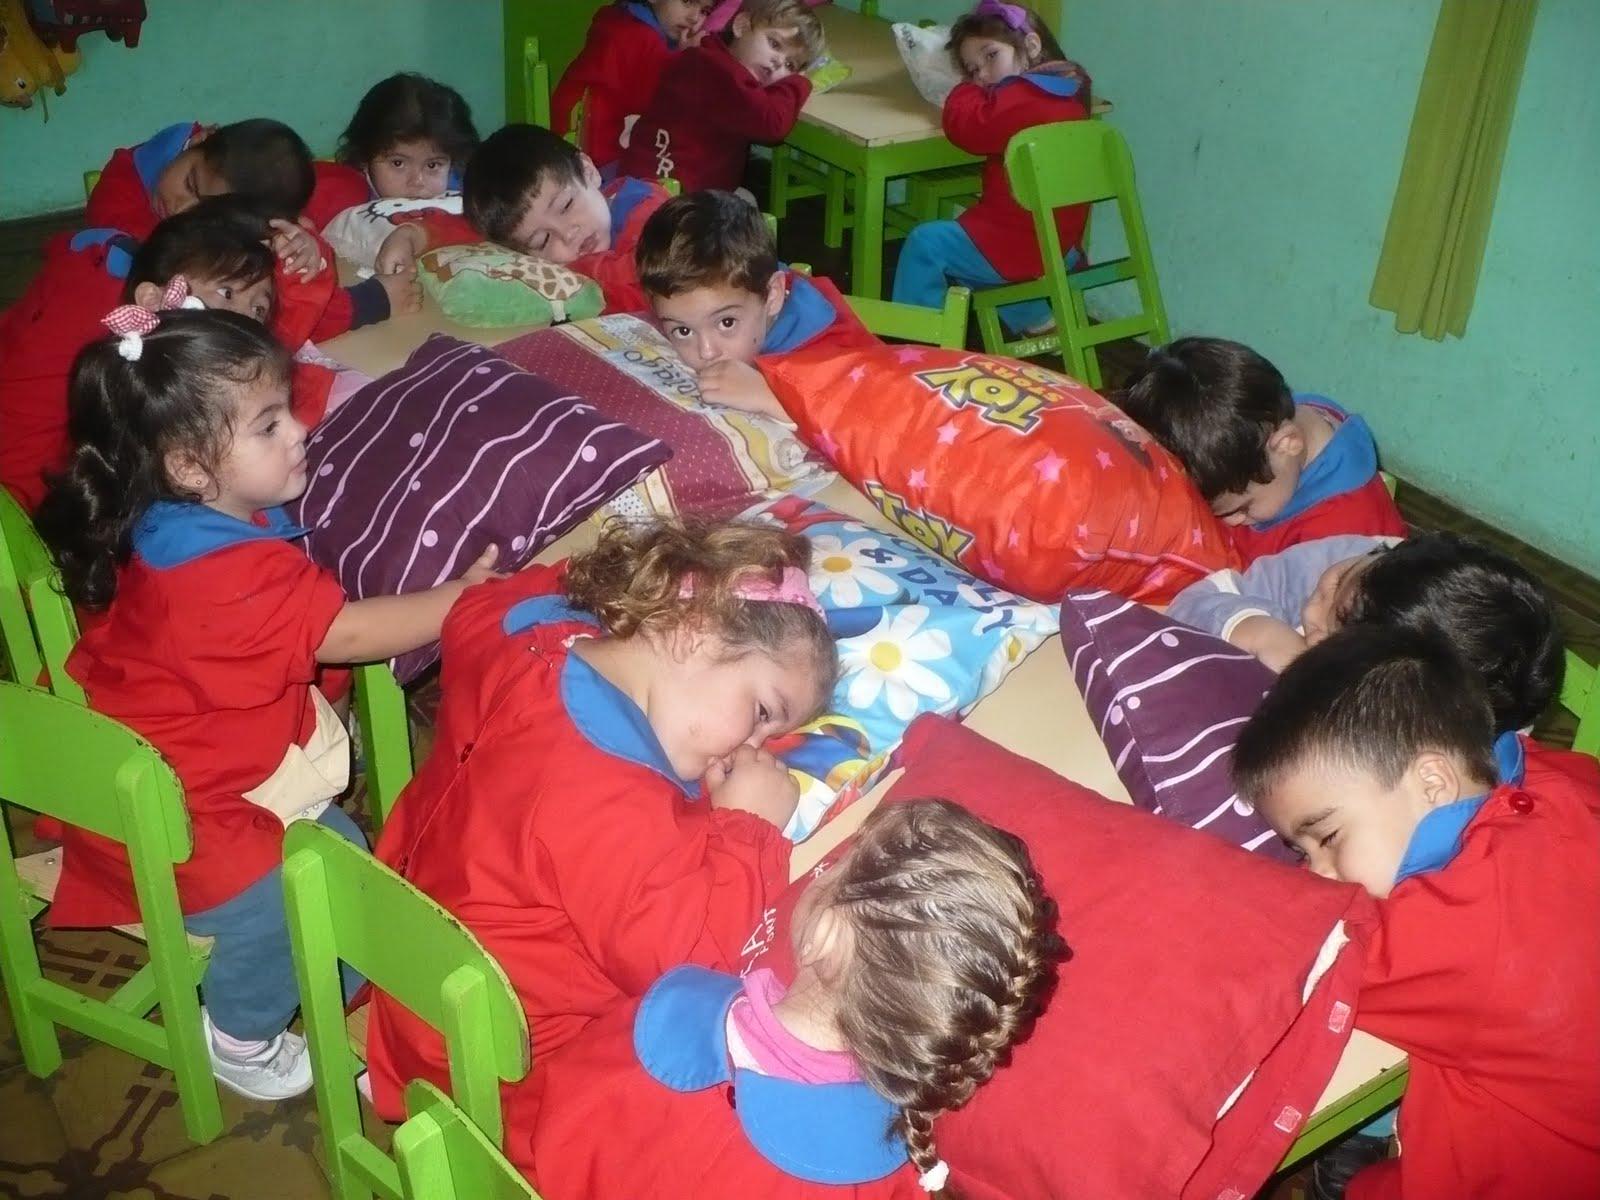 Jard n maternal las aventuras de cristian y diego hora for Actividades para jardin maternal sala de 2